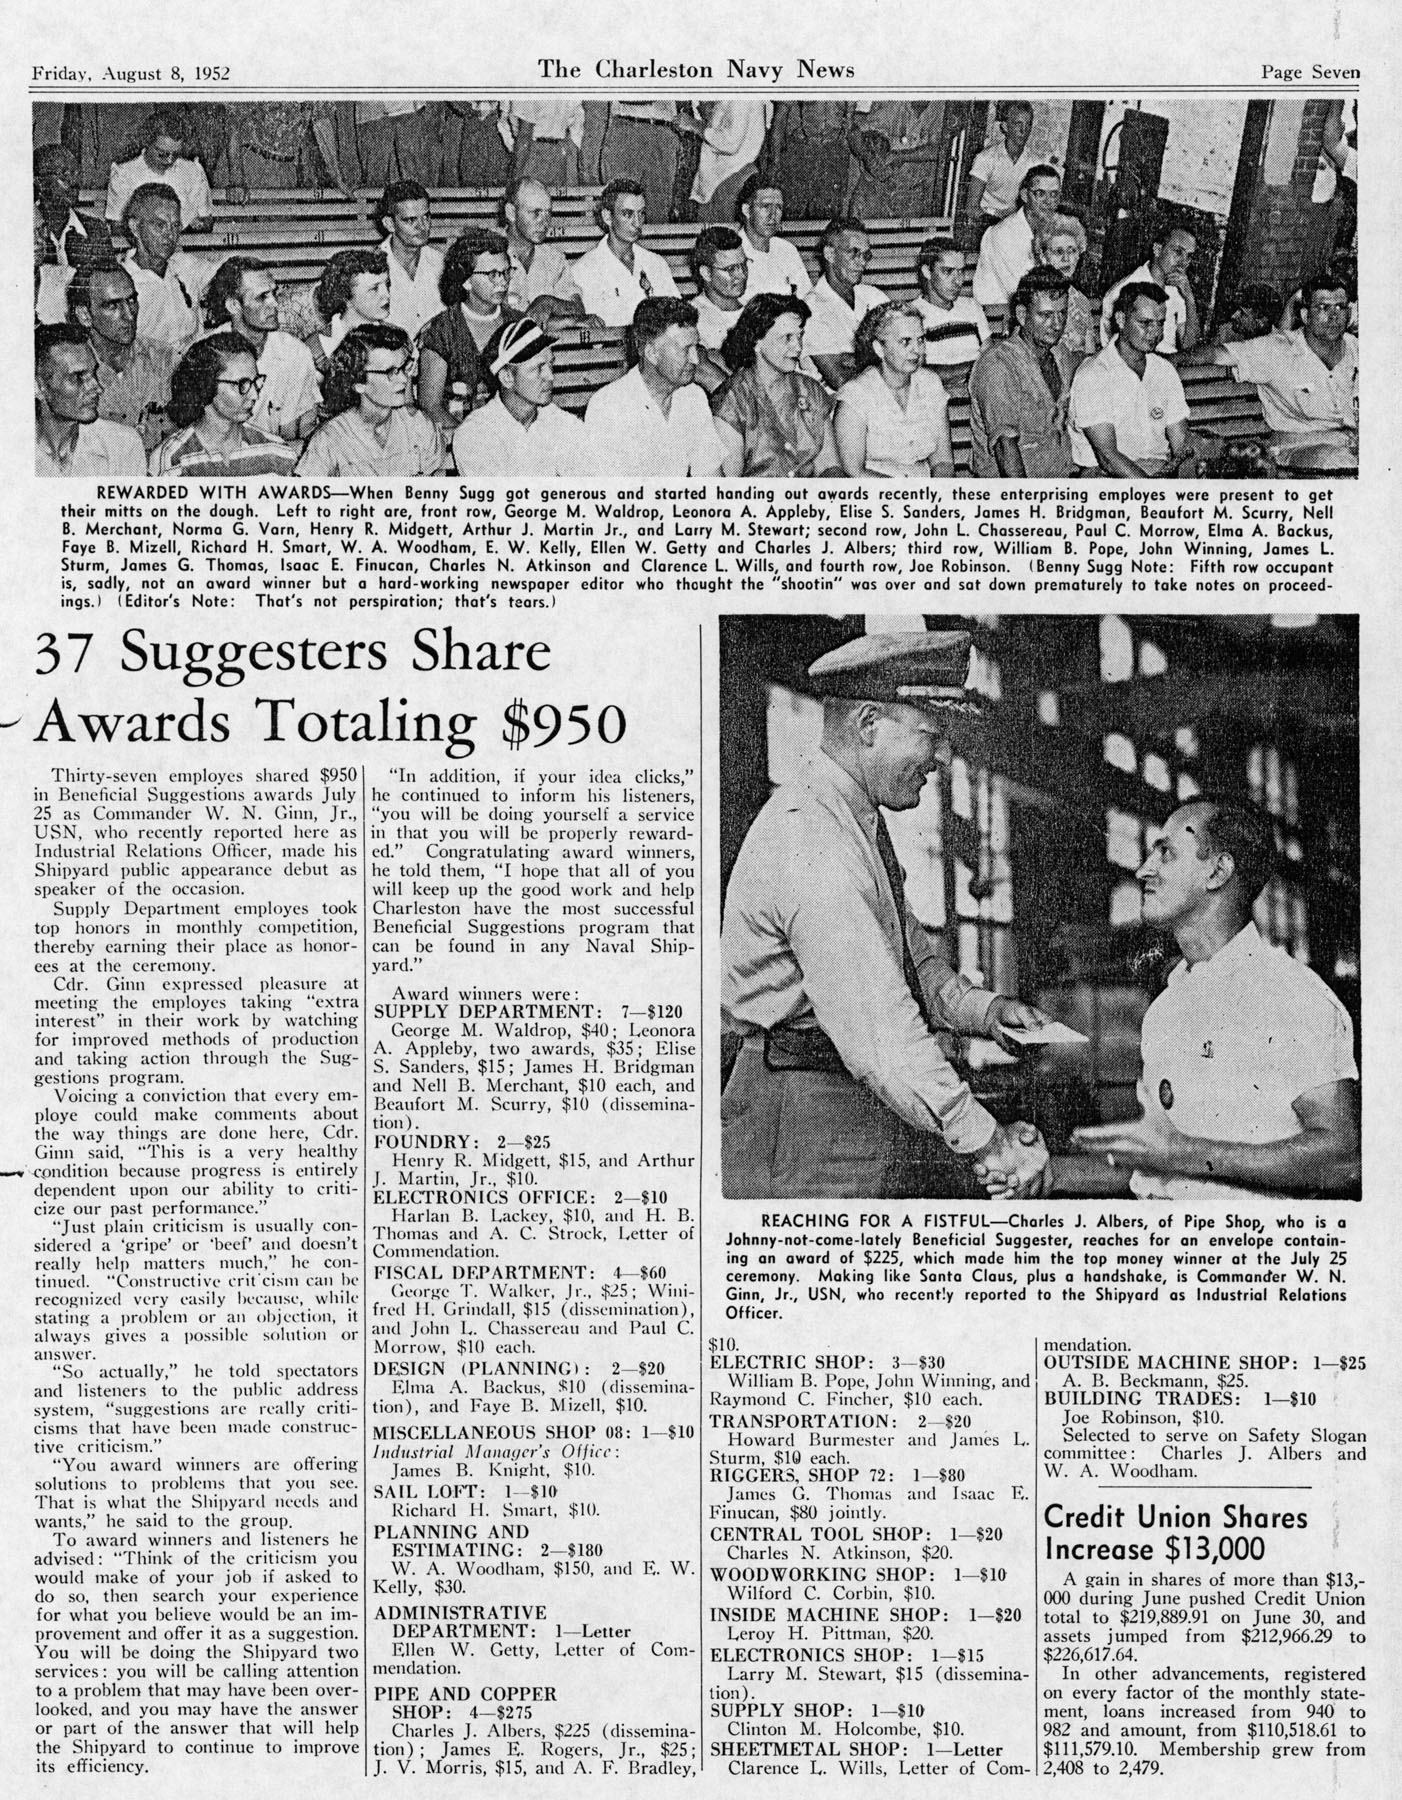 The Charleston Navy News, Volume 11, Edition 1, page vii